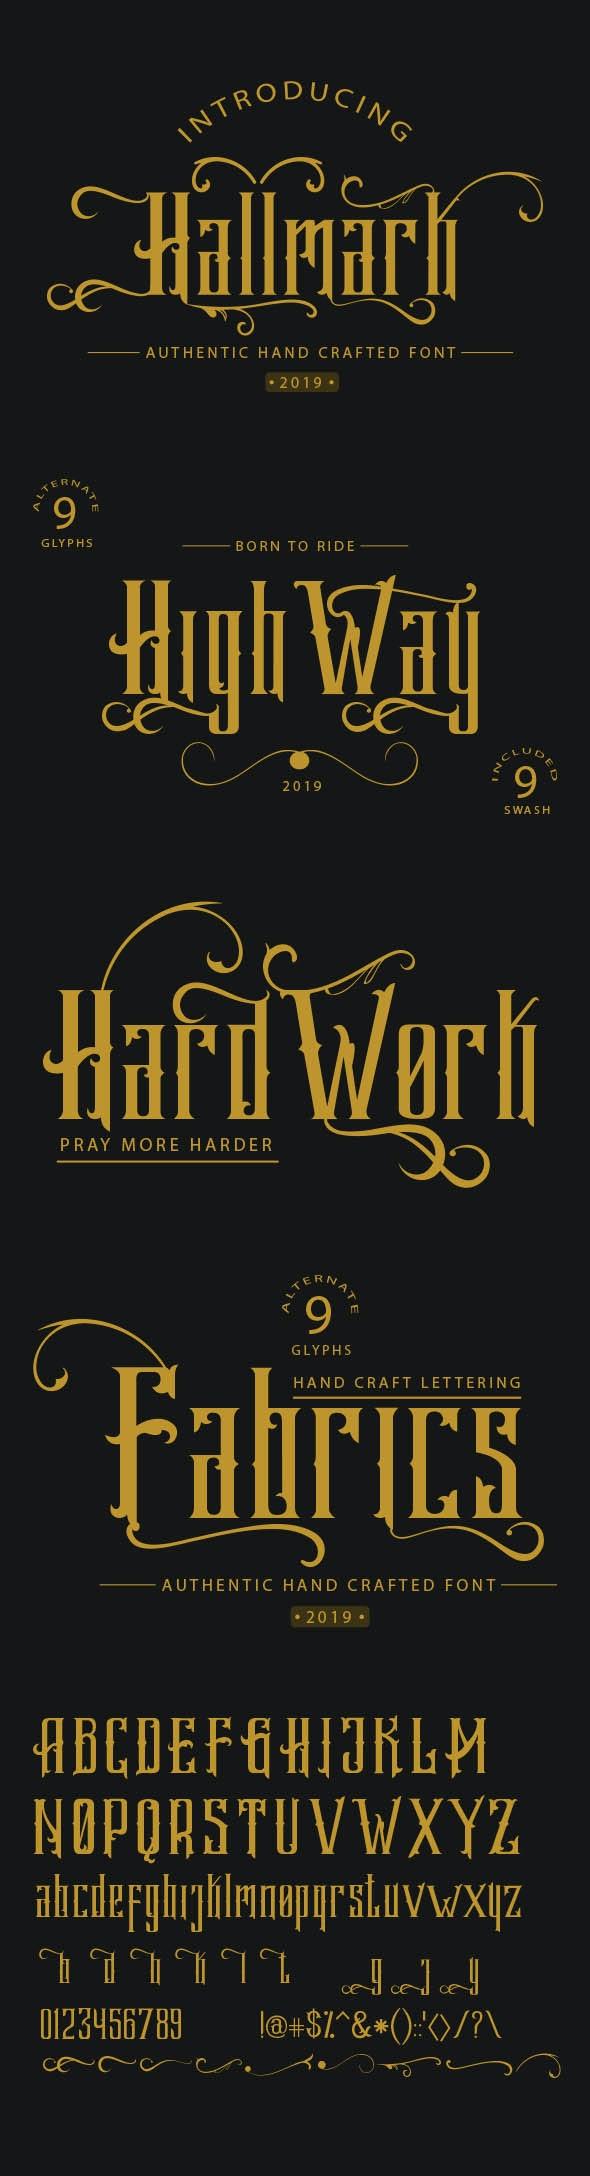 Hallmark - Decorative Fonts